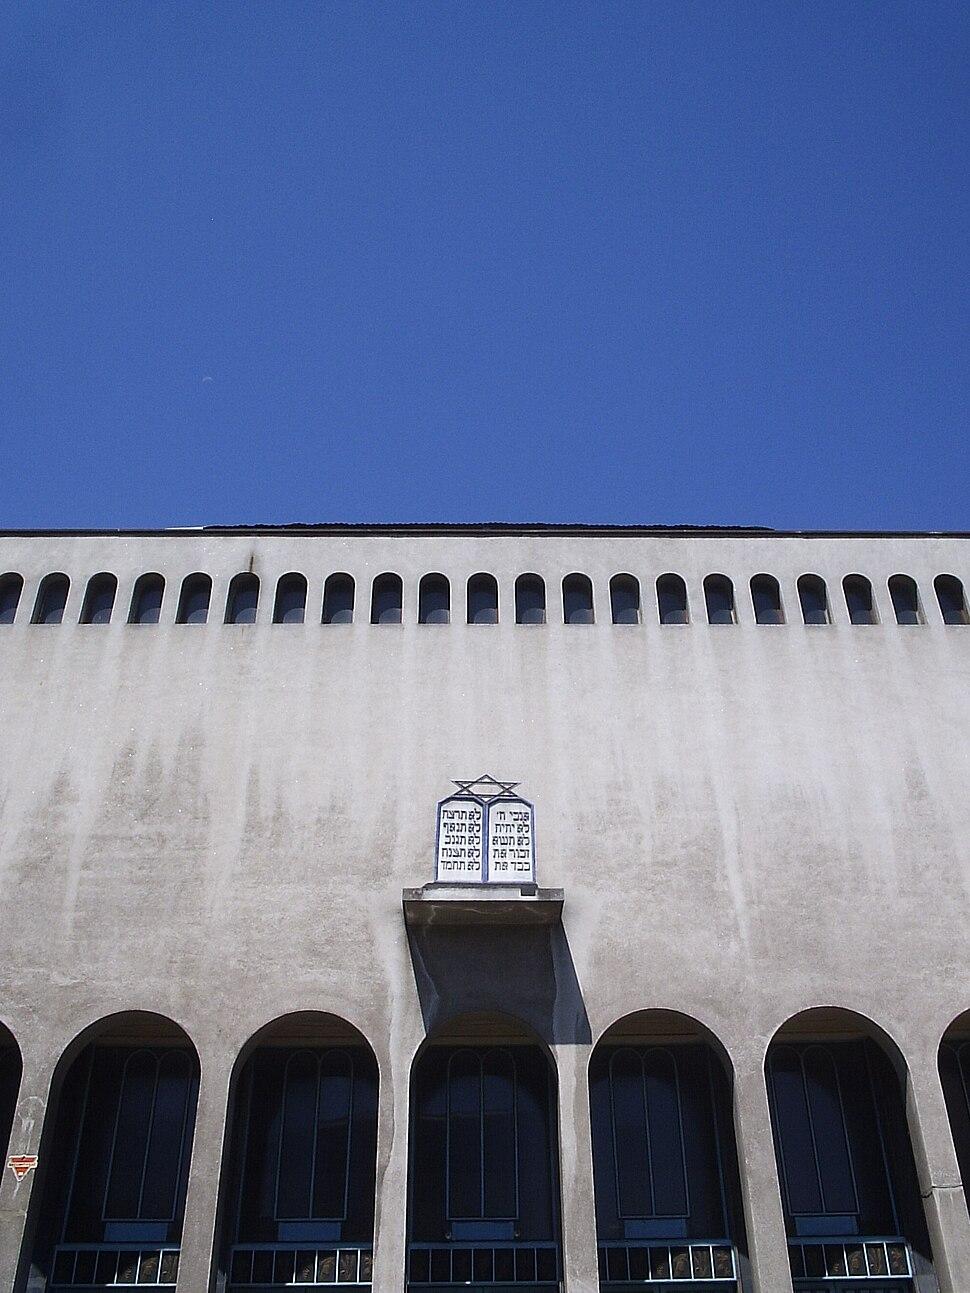 SynagogueSantiago